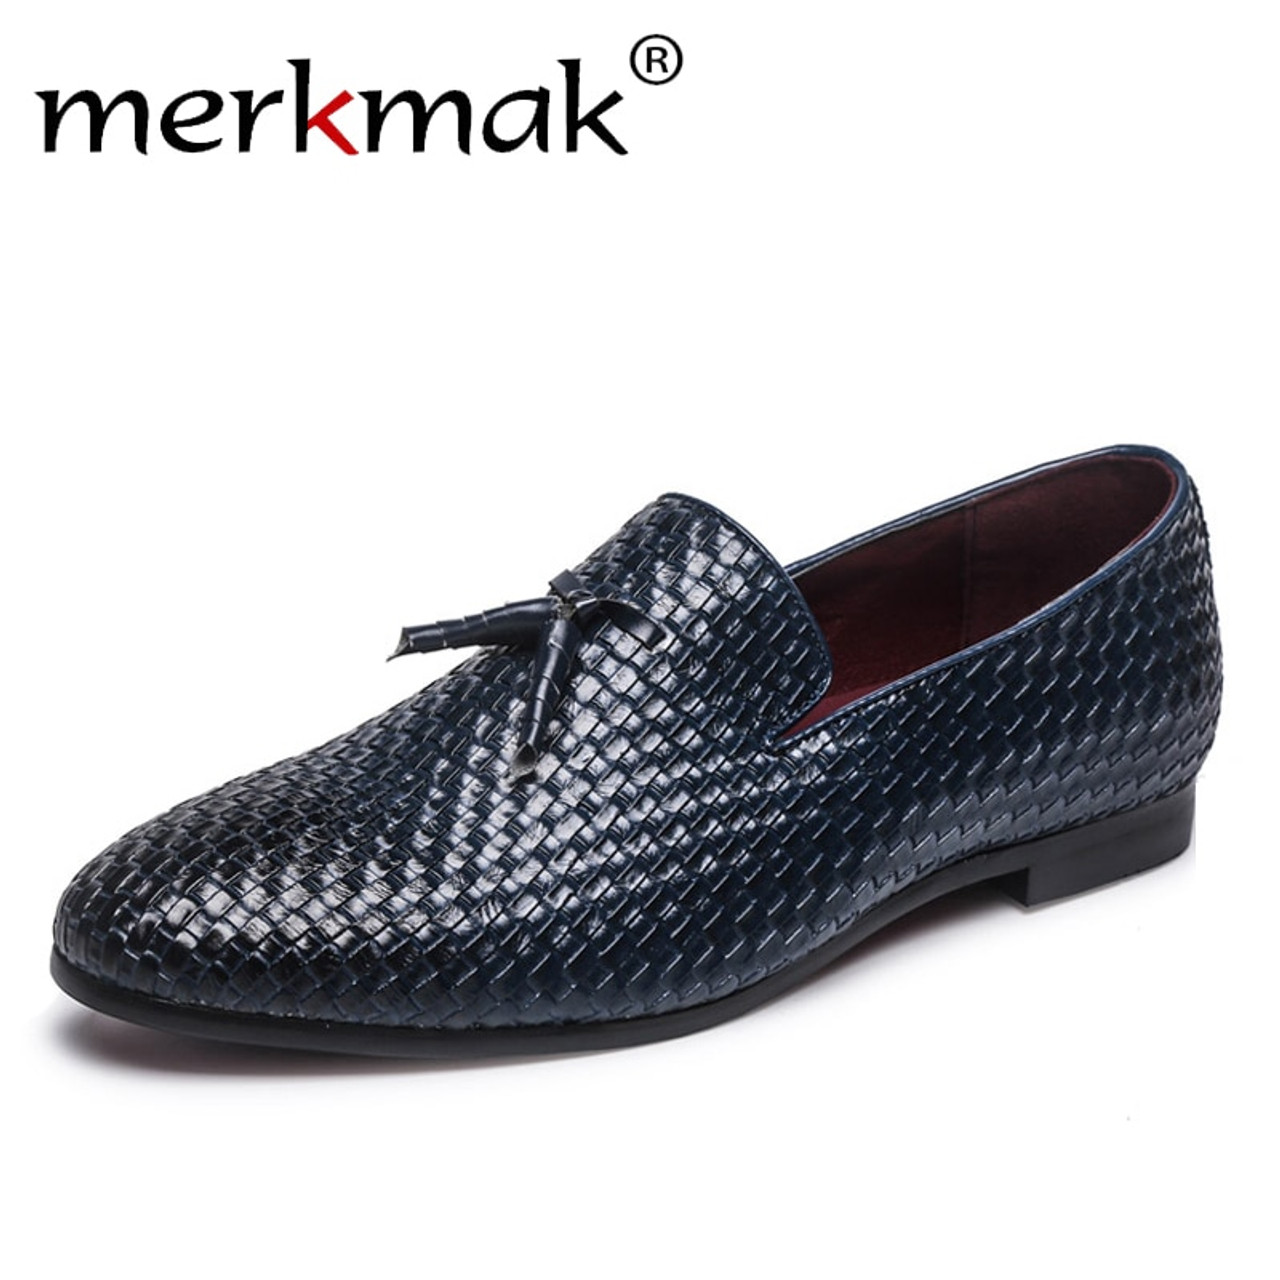 cceab2c7c67 Merkmak Brand Men Shoes 2018 New Breathable Comfortable Men Loafers Luxury  Tassel Weave Men s Flats Men ...